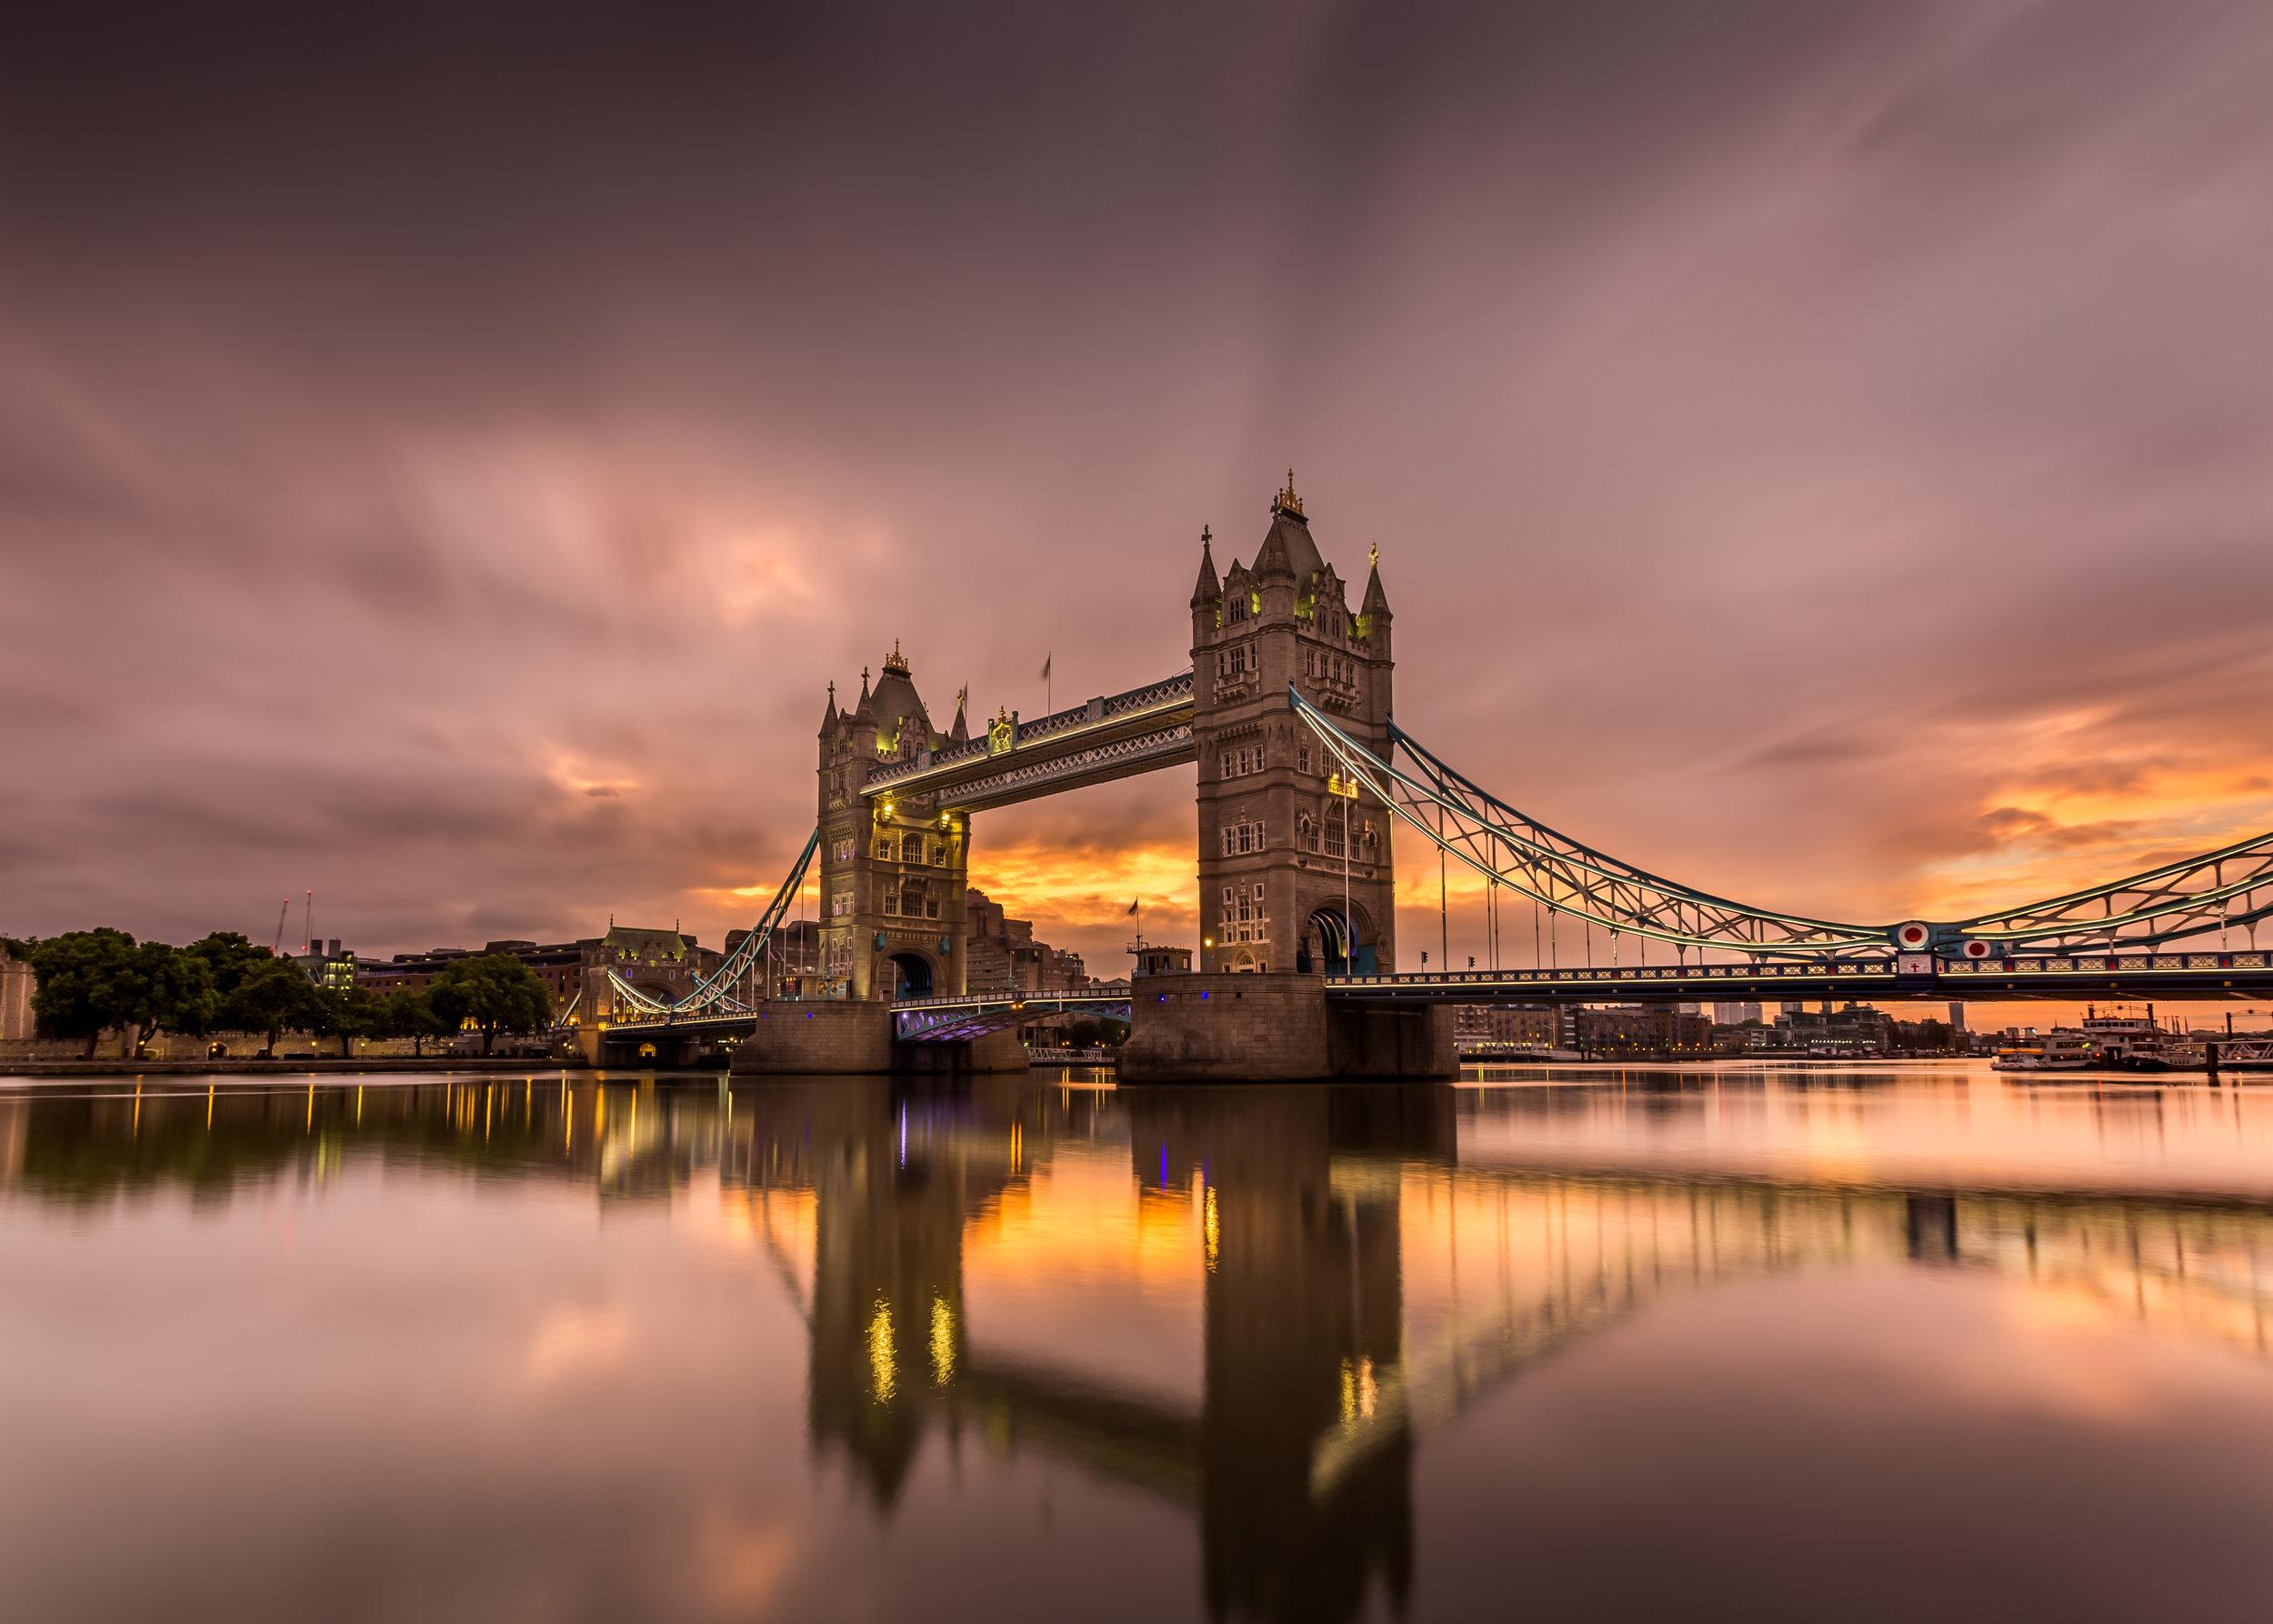 tower-bridge-1-3.jpg